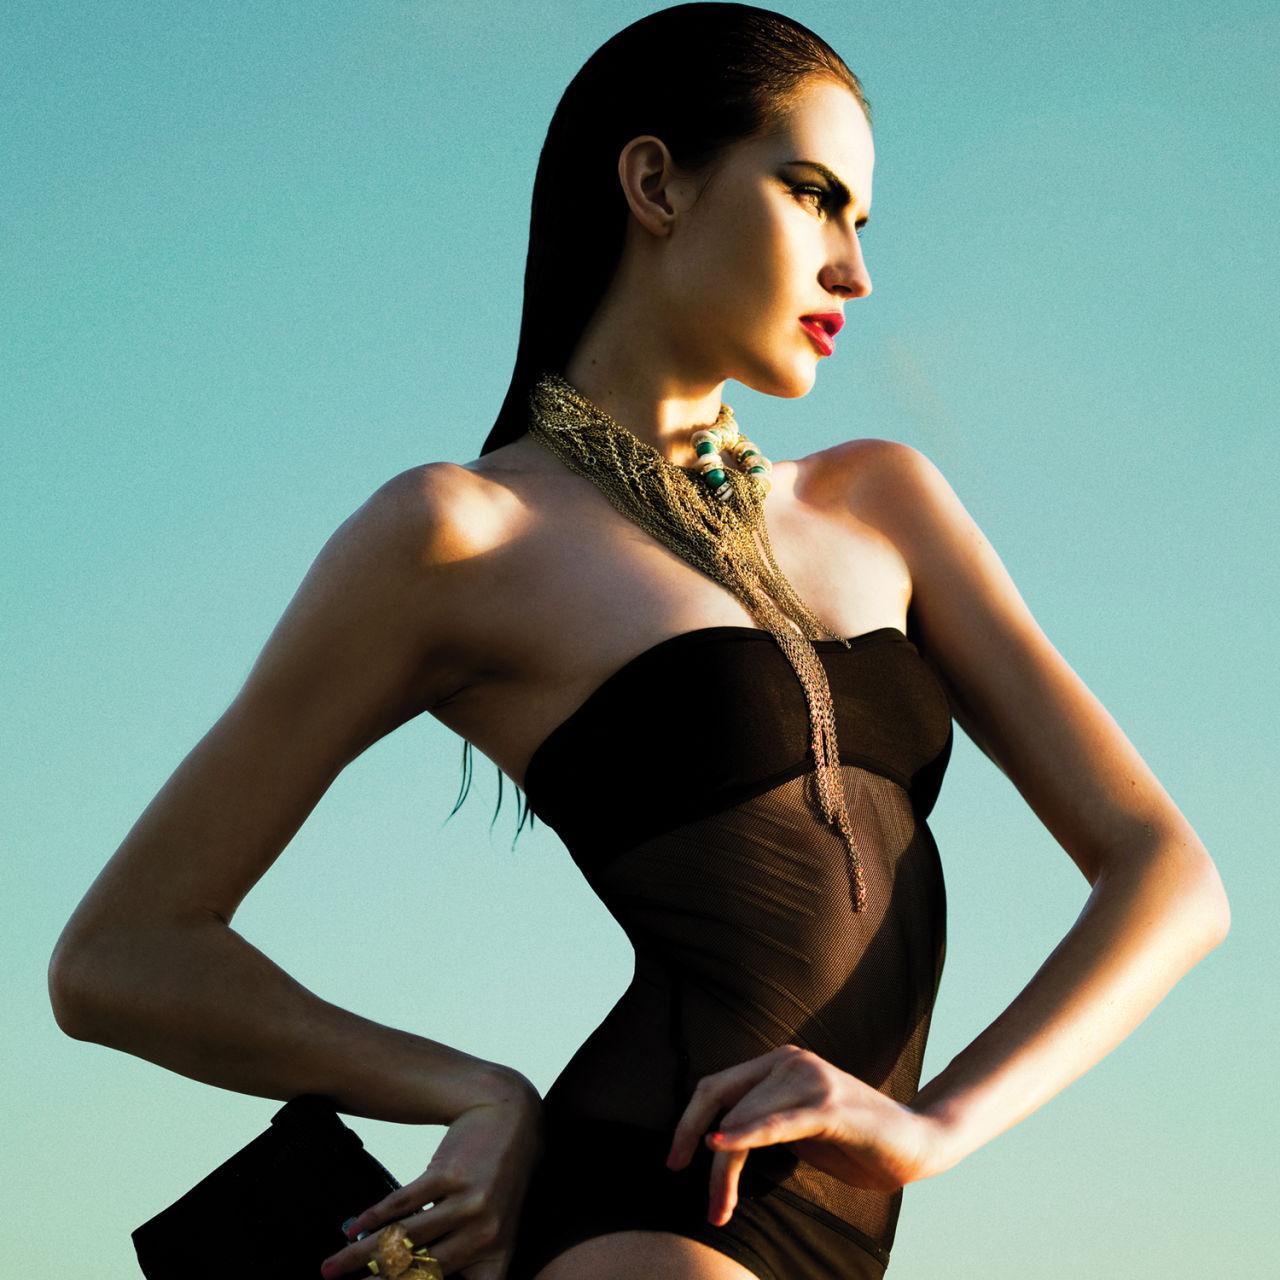 Fitness/Body - Magazine cover